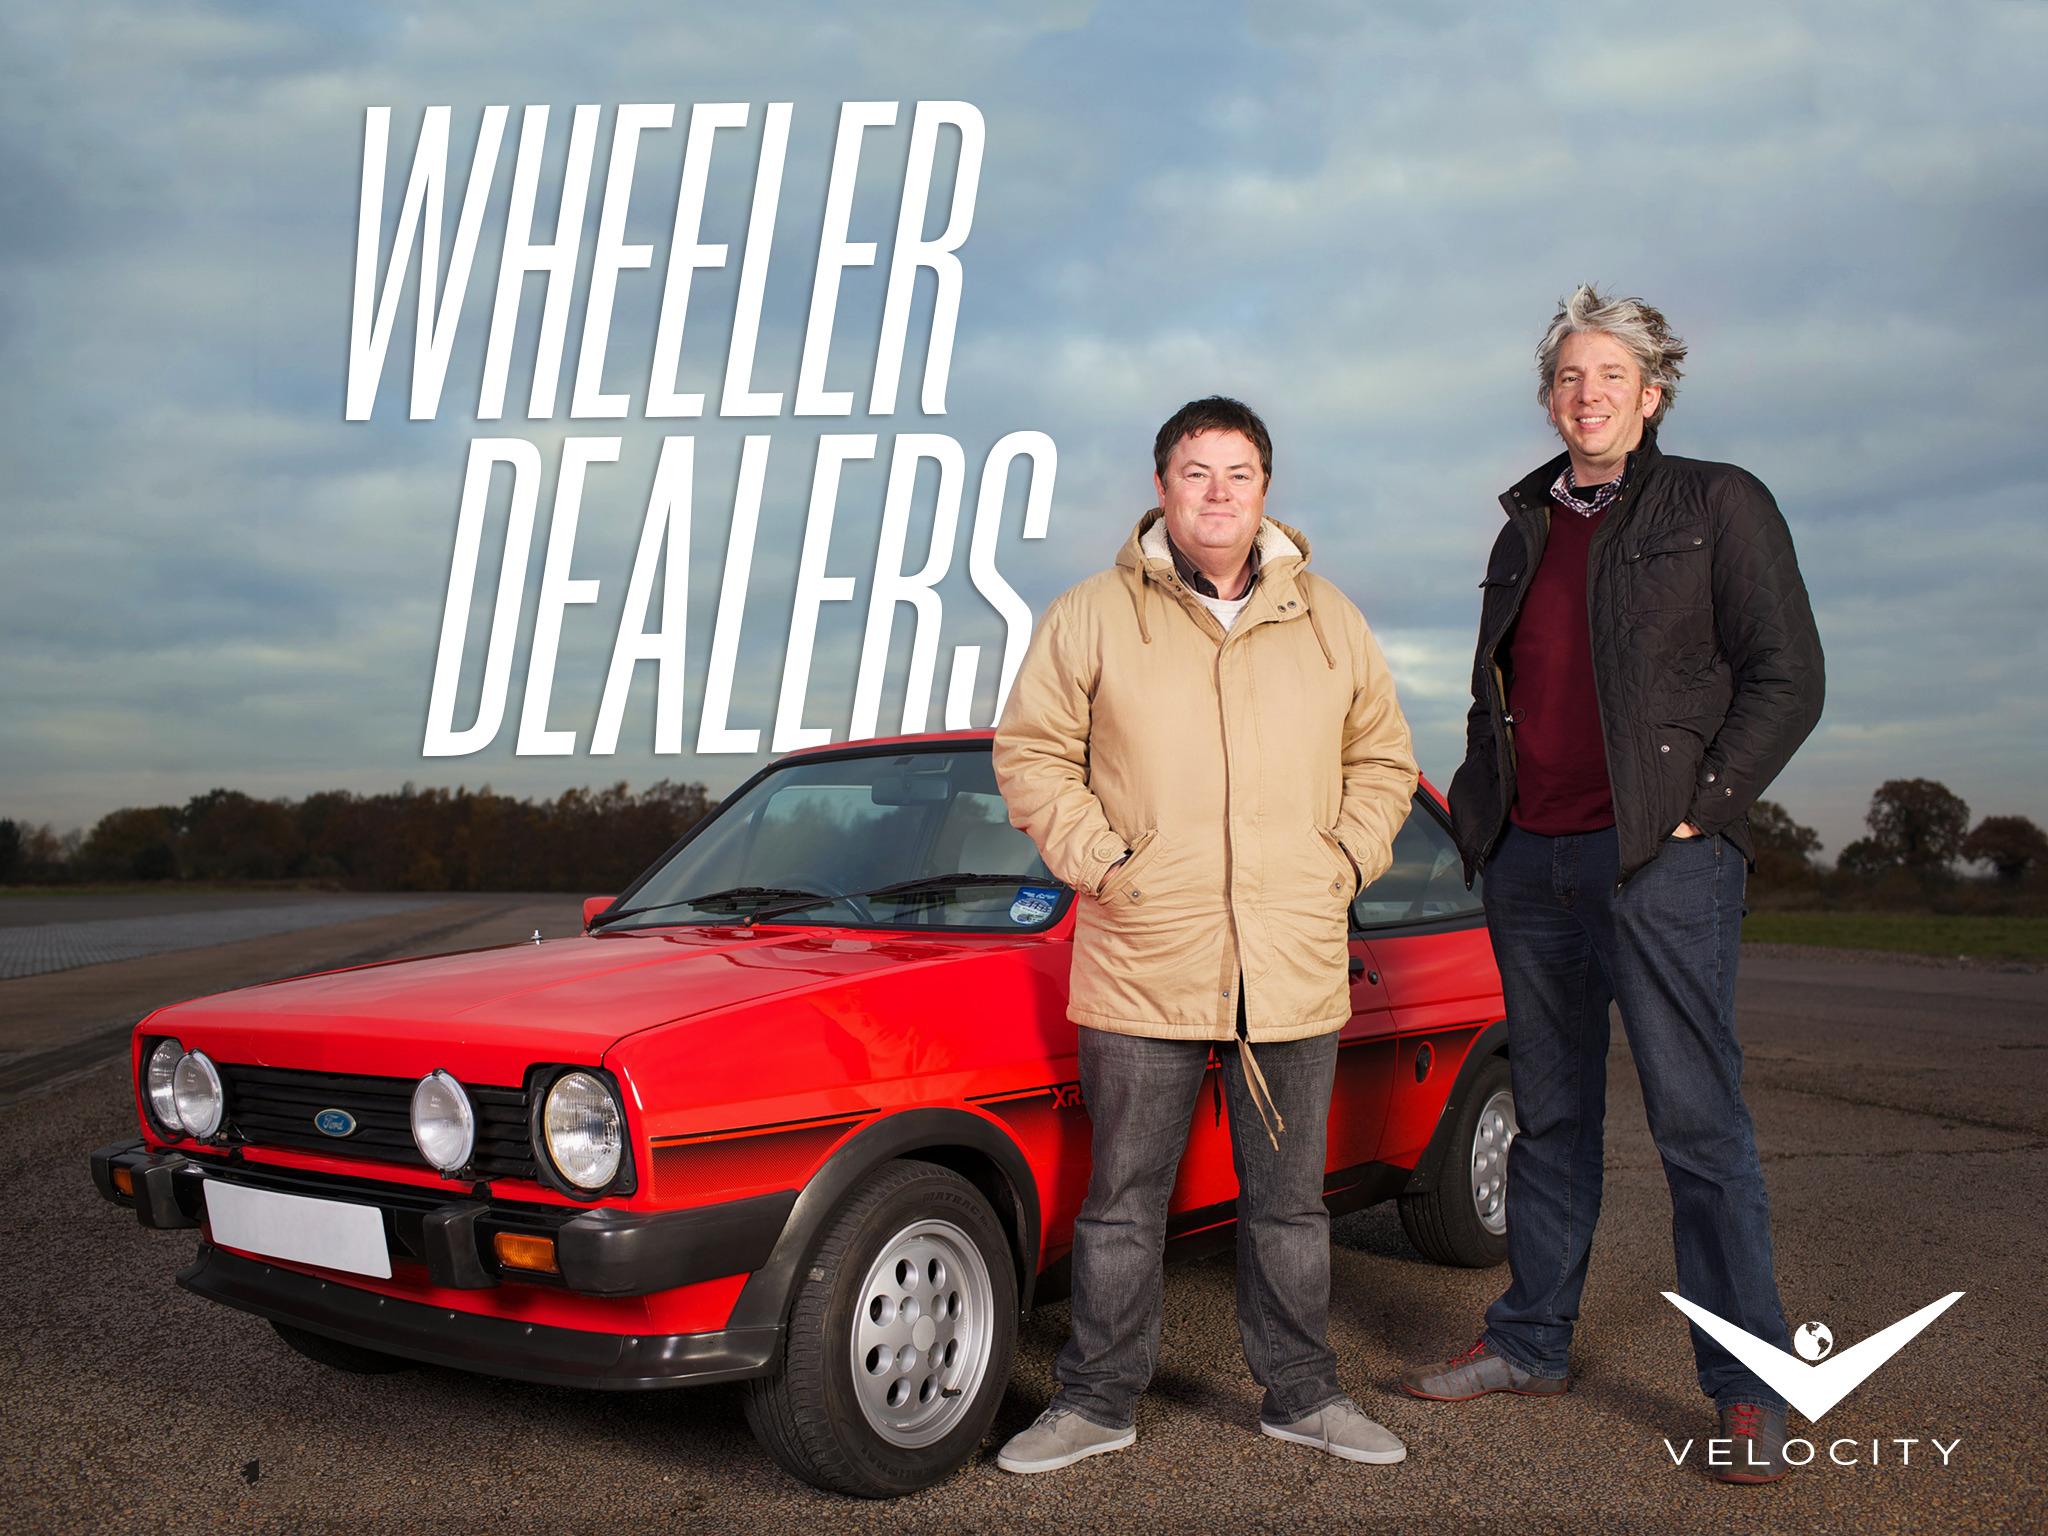 Watch Wheeler Dealers Season 9 Episode 12 Triumph Tr6 On Discovery